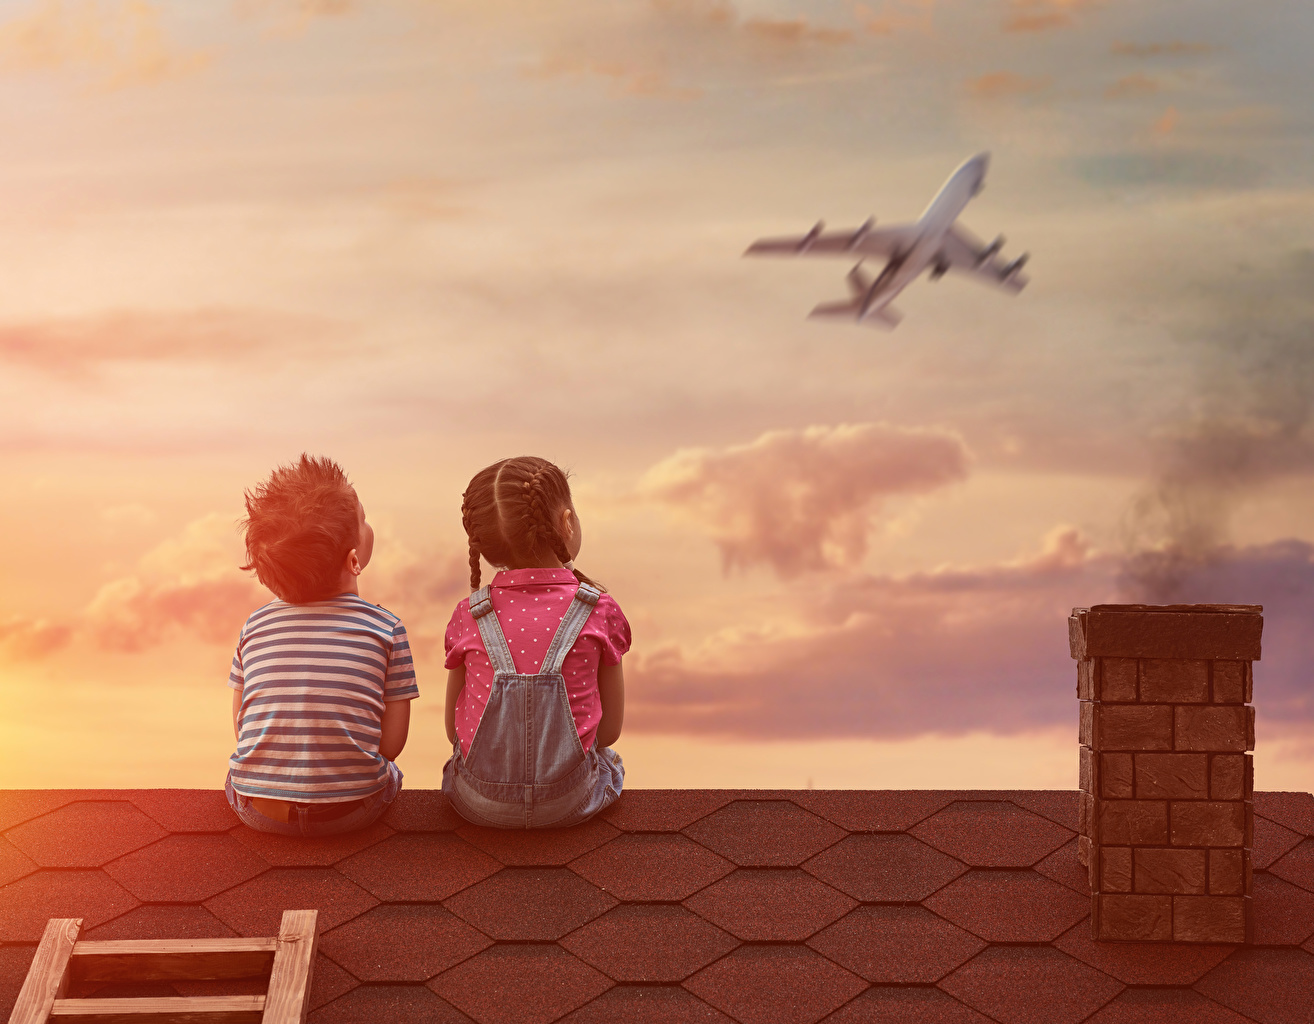 Airplane_Boys_Little_girls_Two_Human_back_Sitting_512820_1314x1024